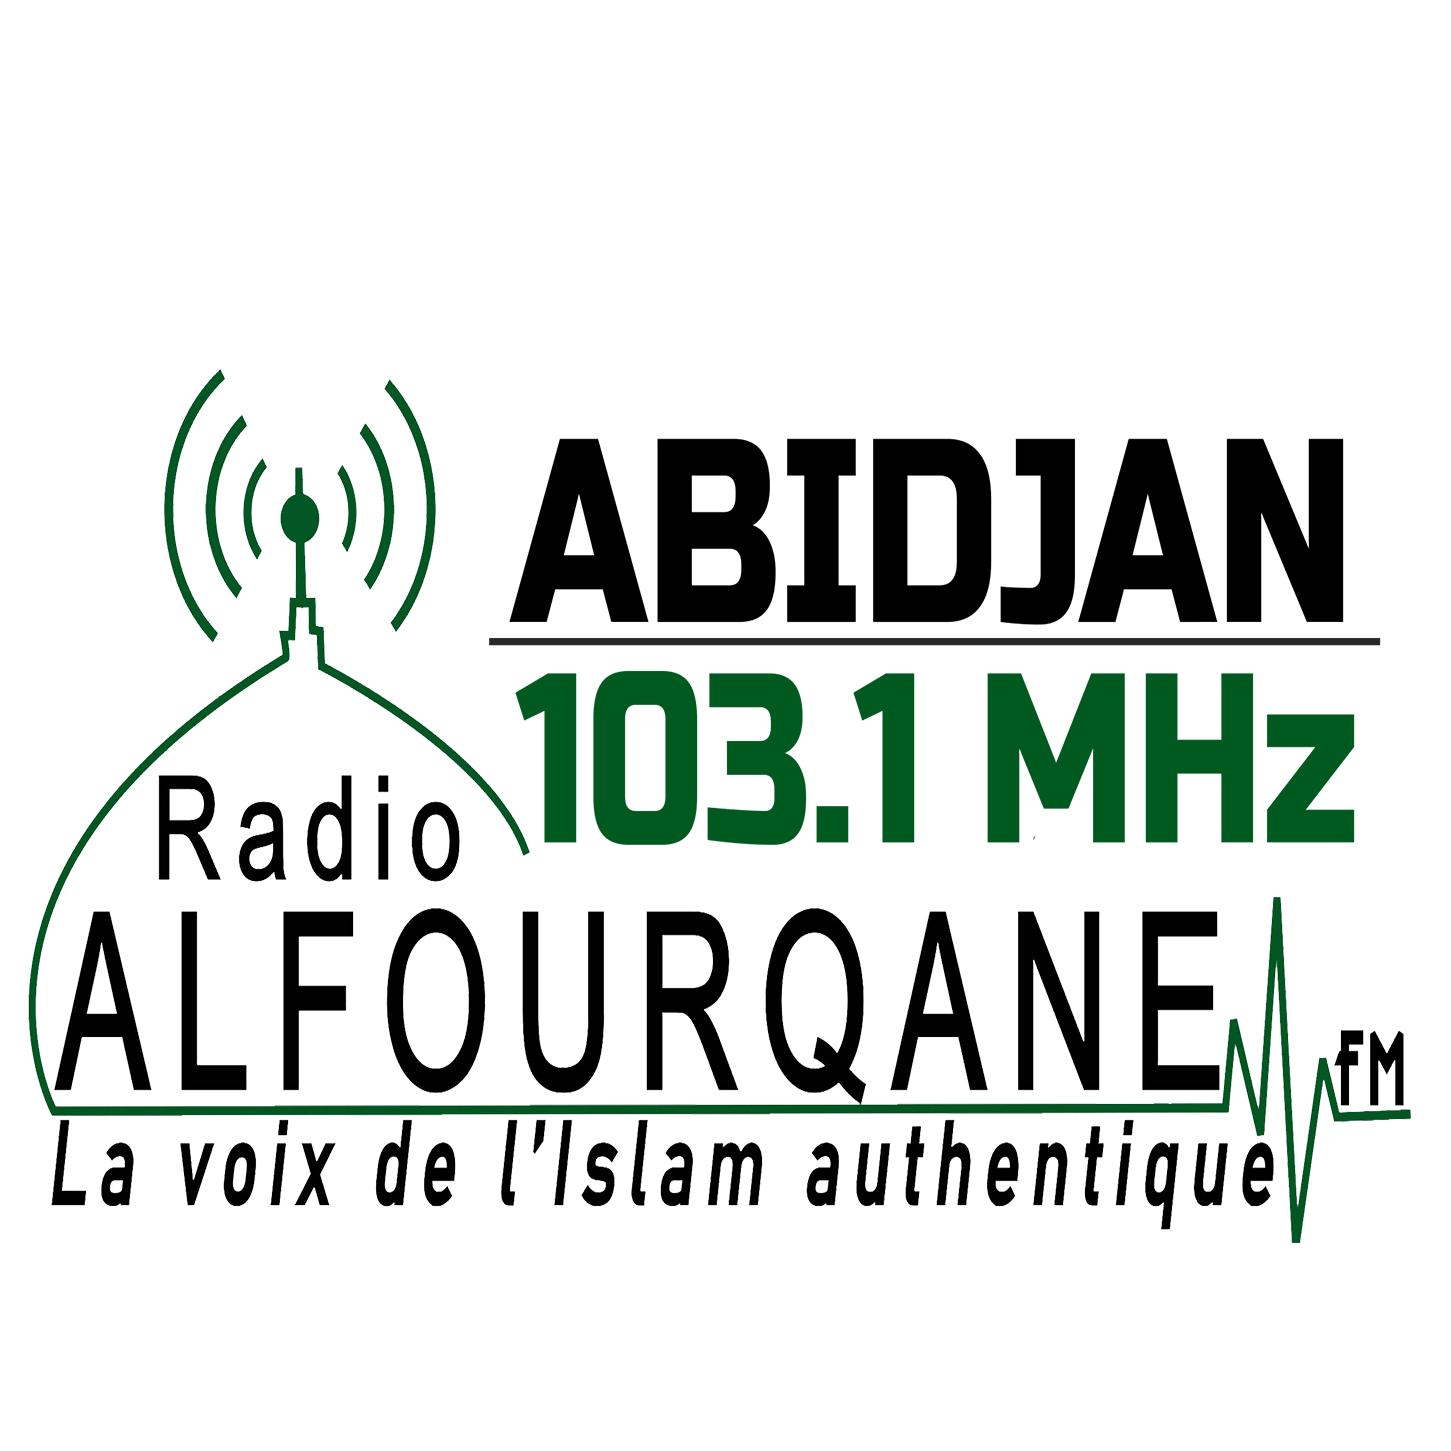 ALFOURQANE